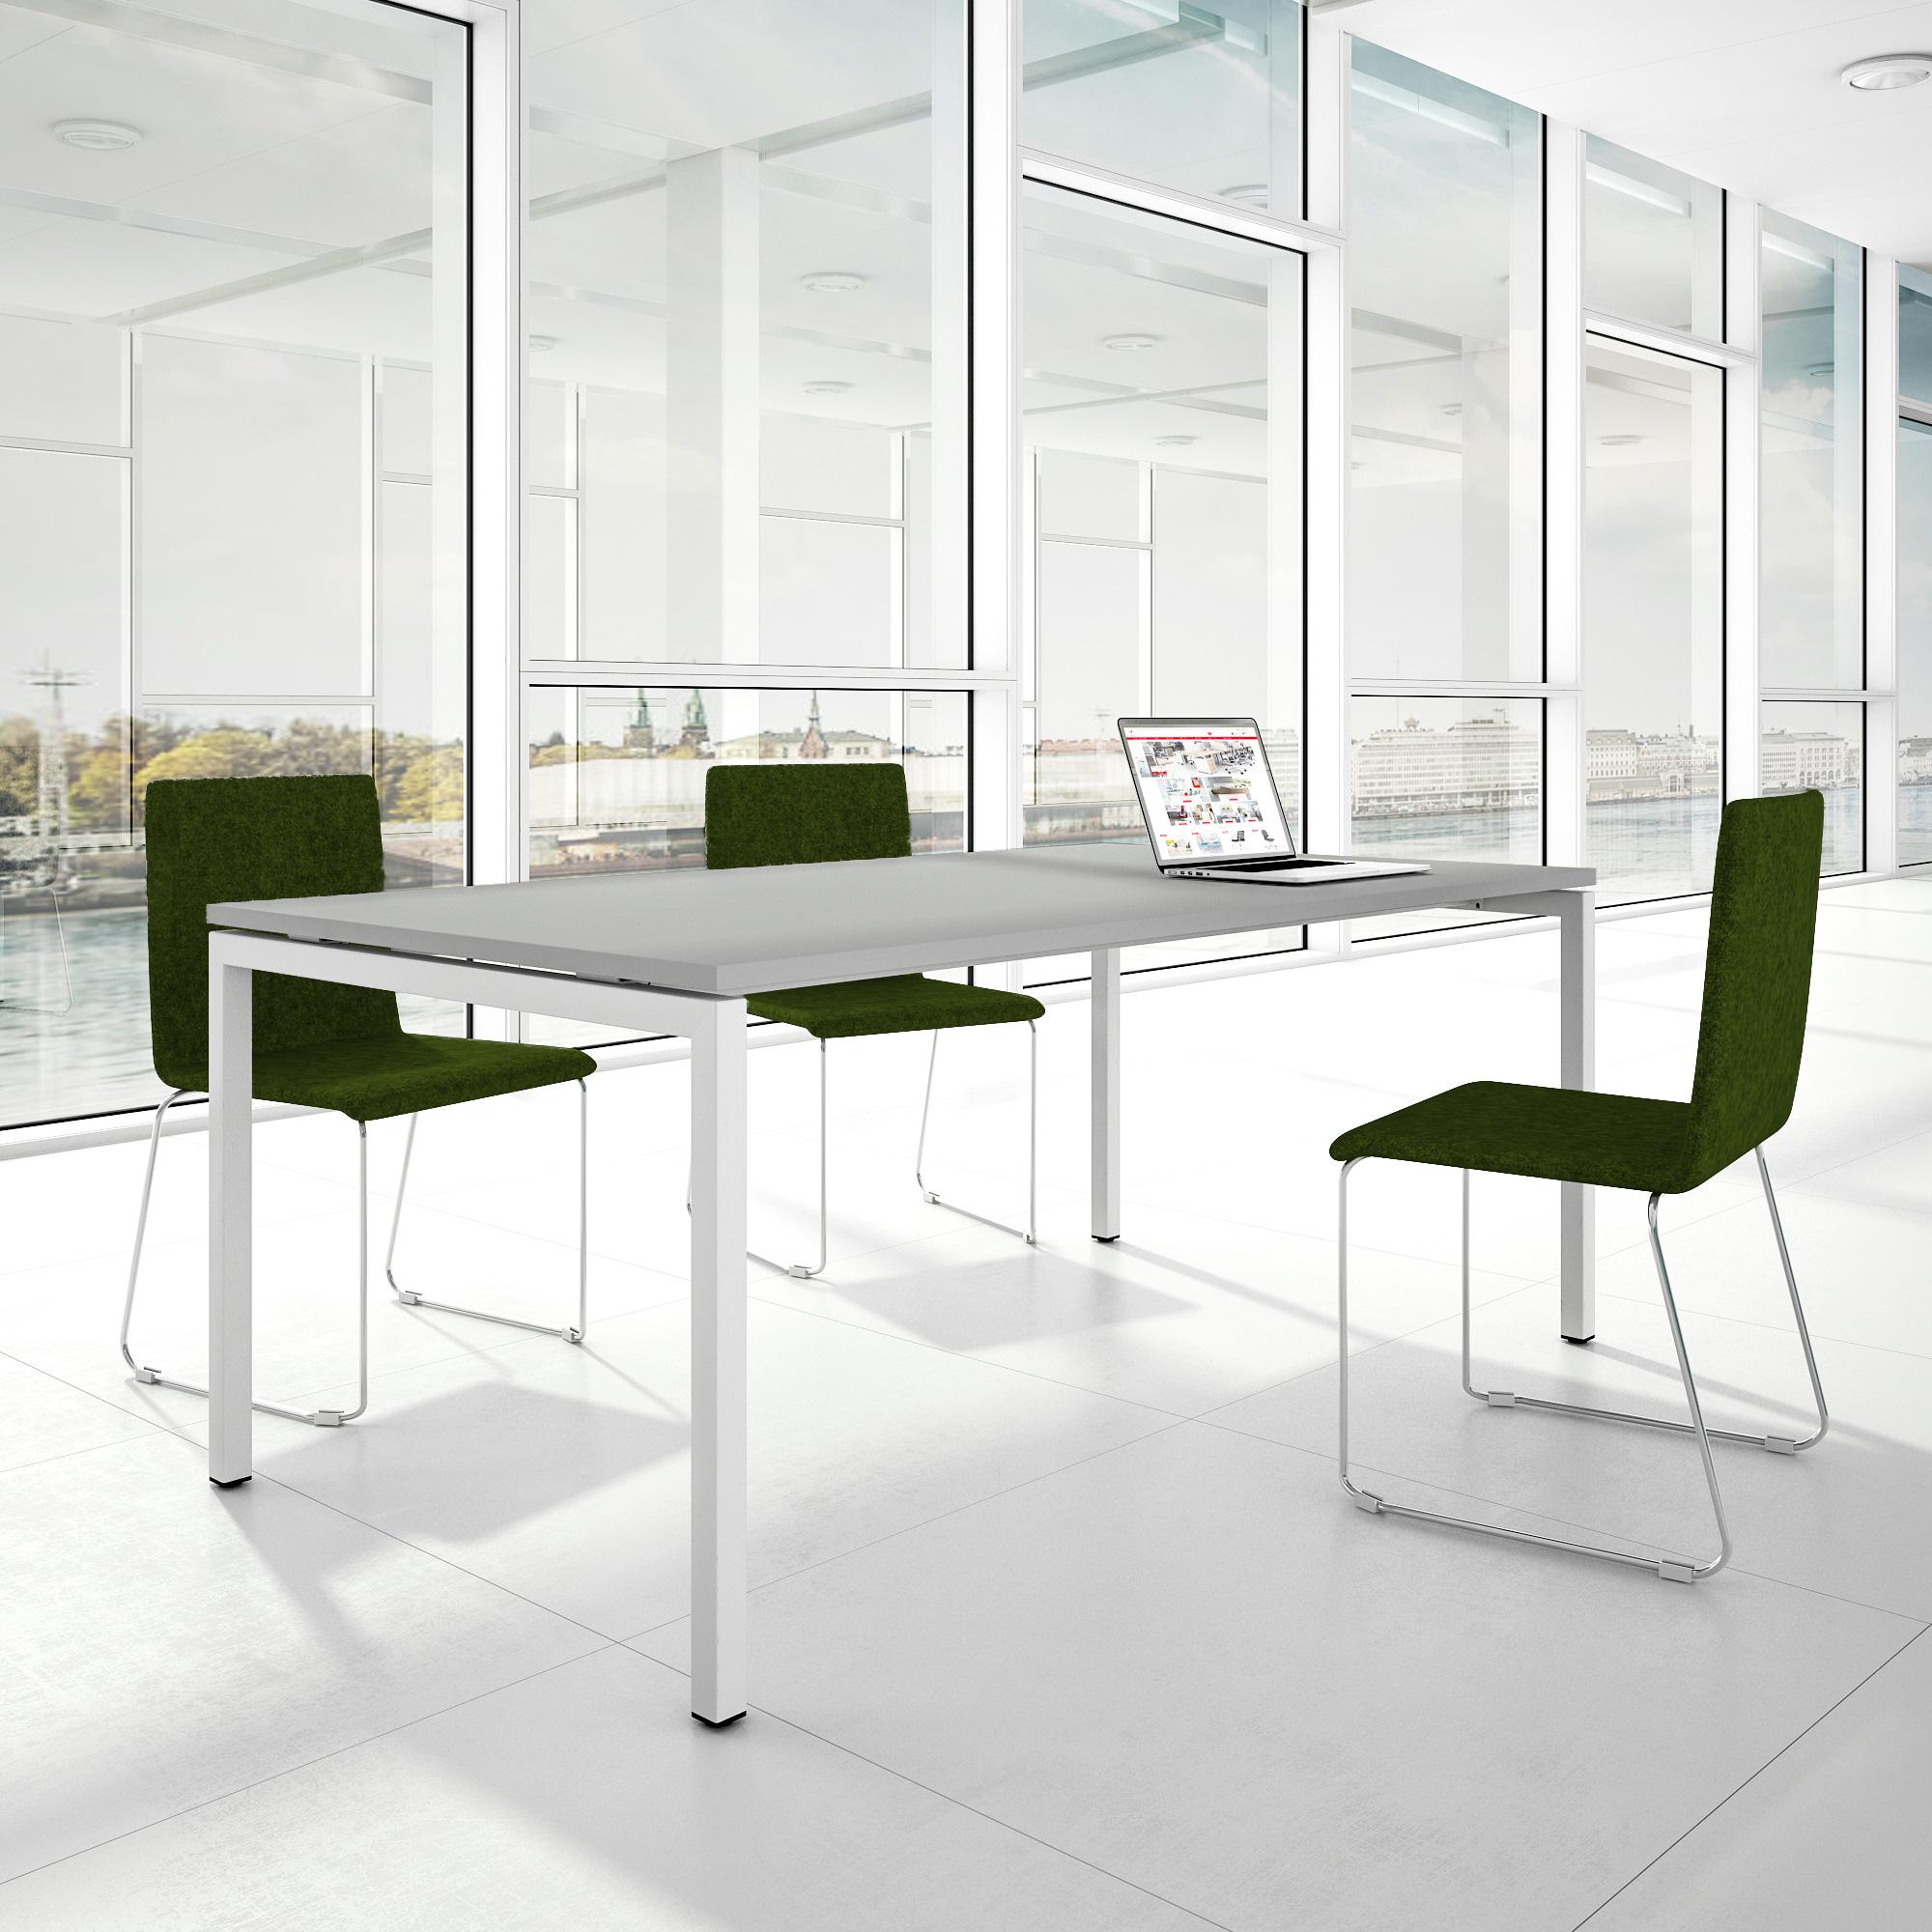 PROFI Besprechungstisch 200x100cm NOVA U 4-8 Pers. Konferenztisch Meetingtisch